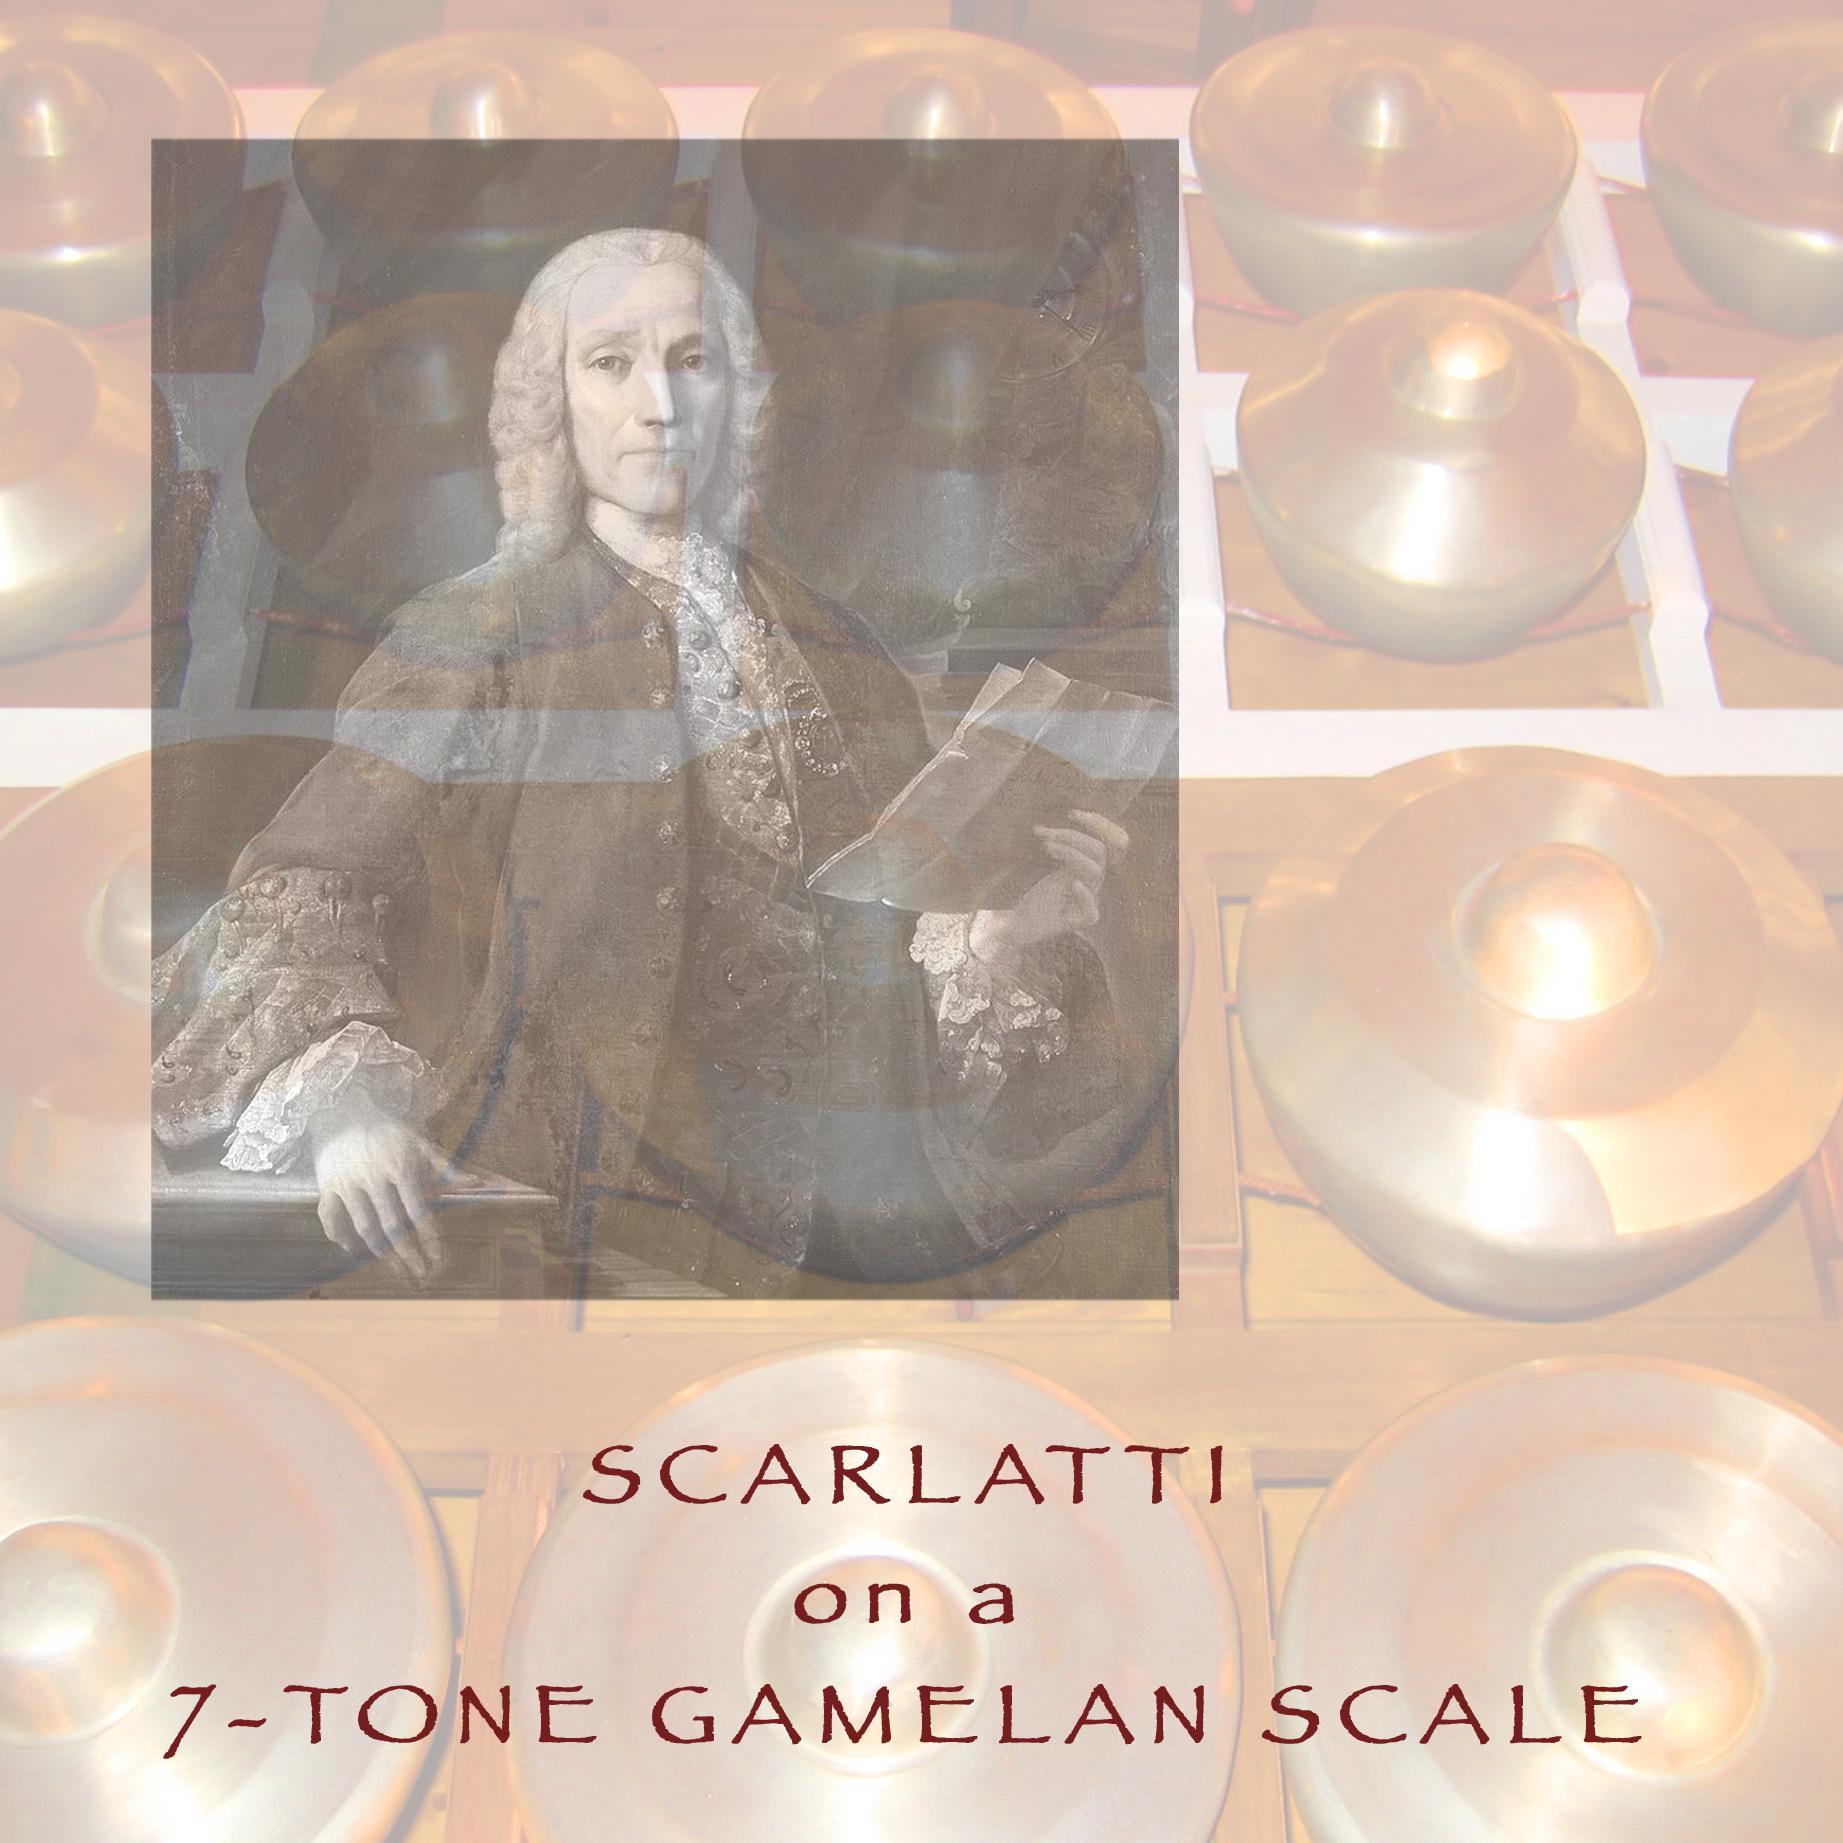 Scarlatti on a 7-Tone Gamelan Scale